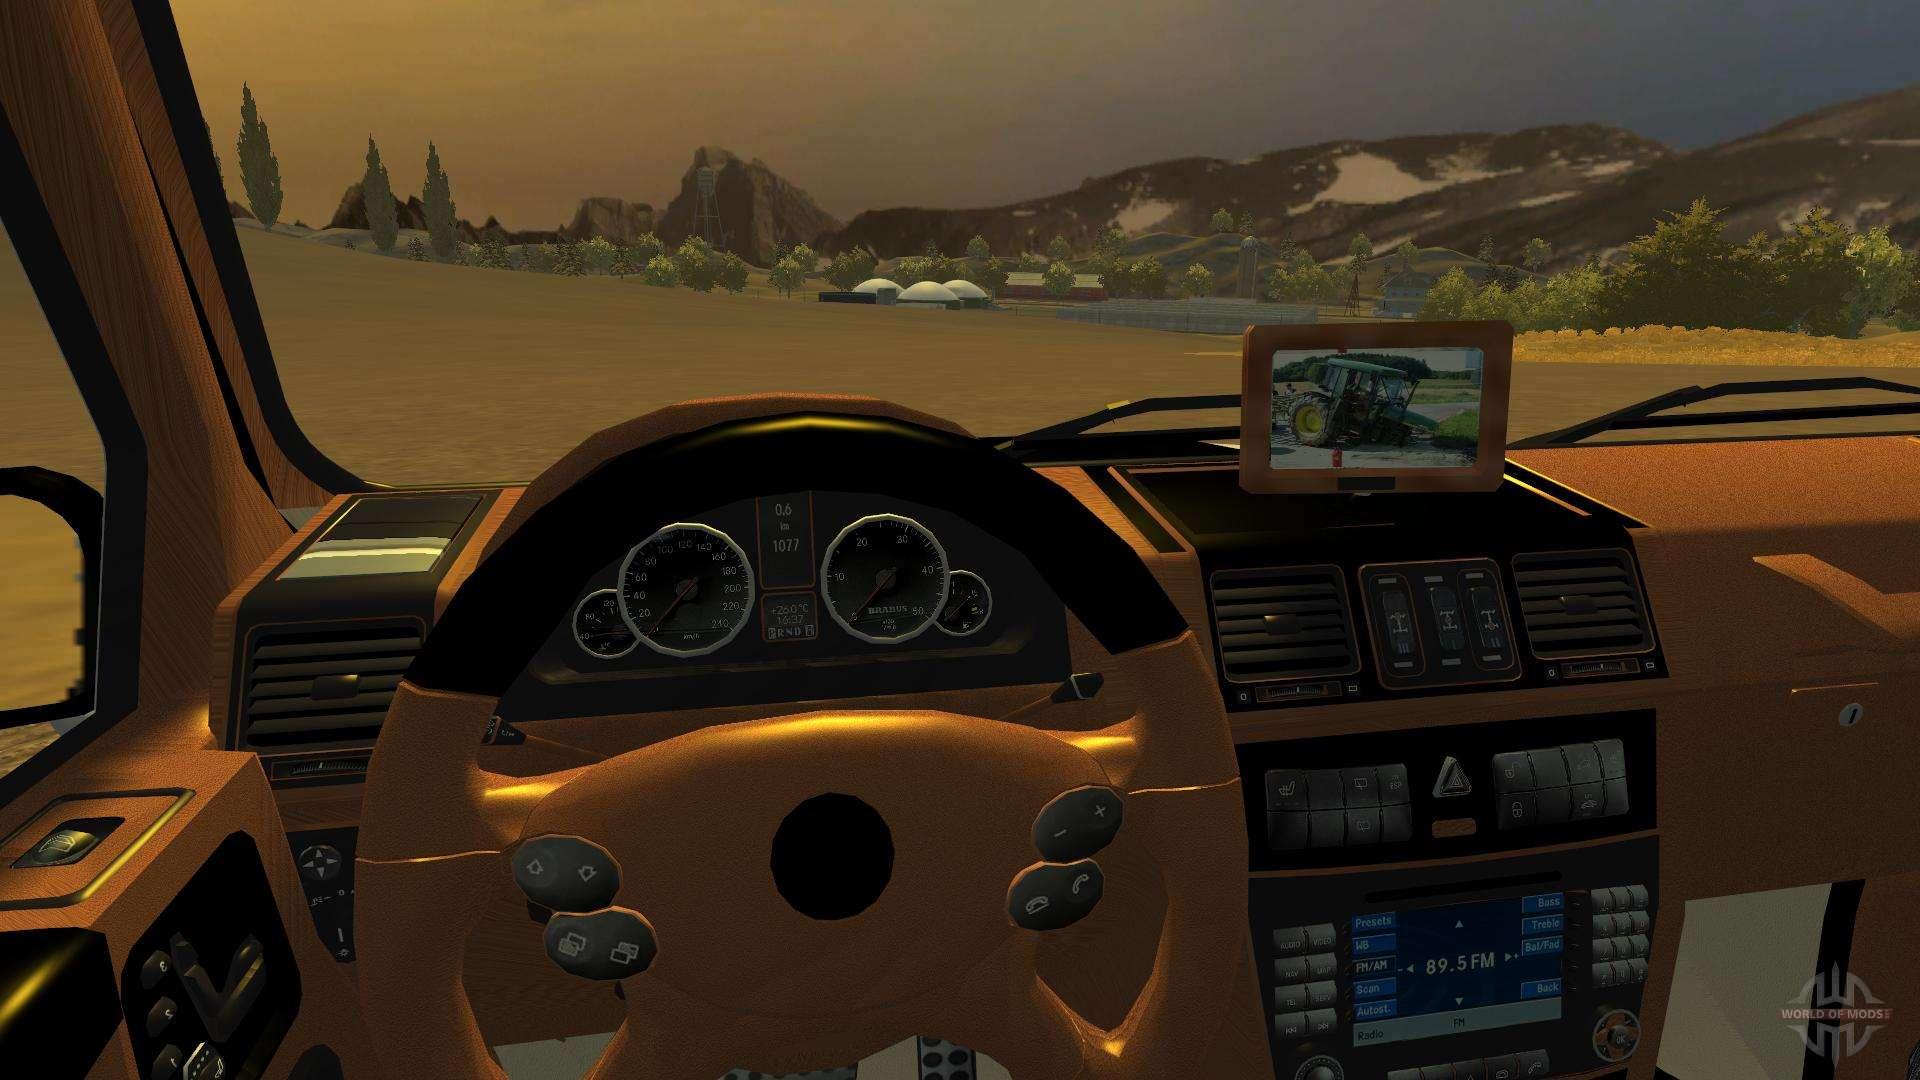 Mercedes benz simulator game free download